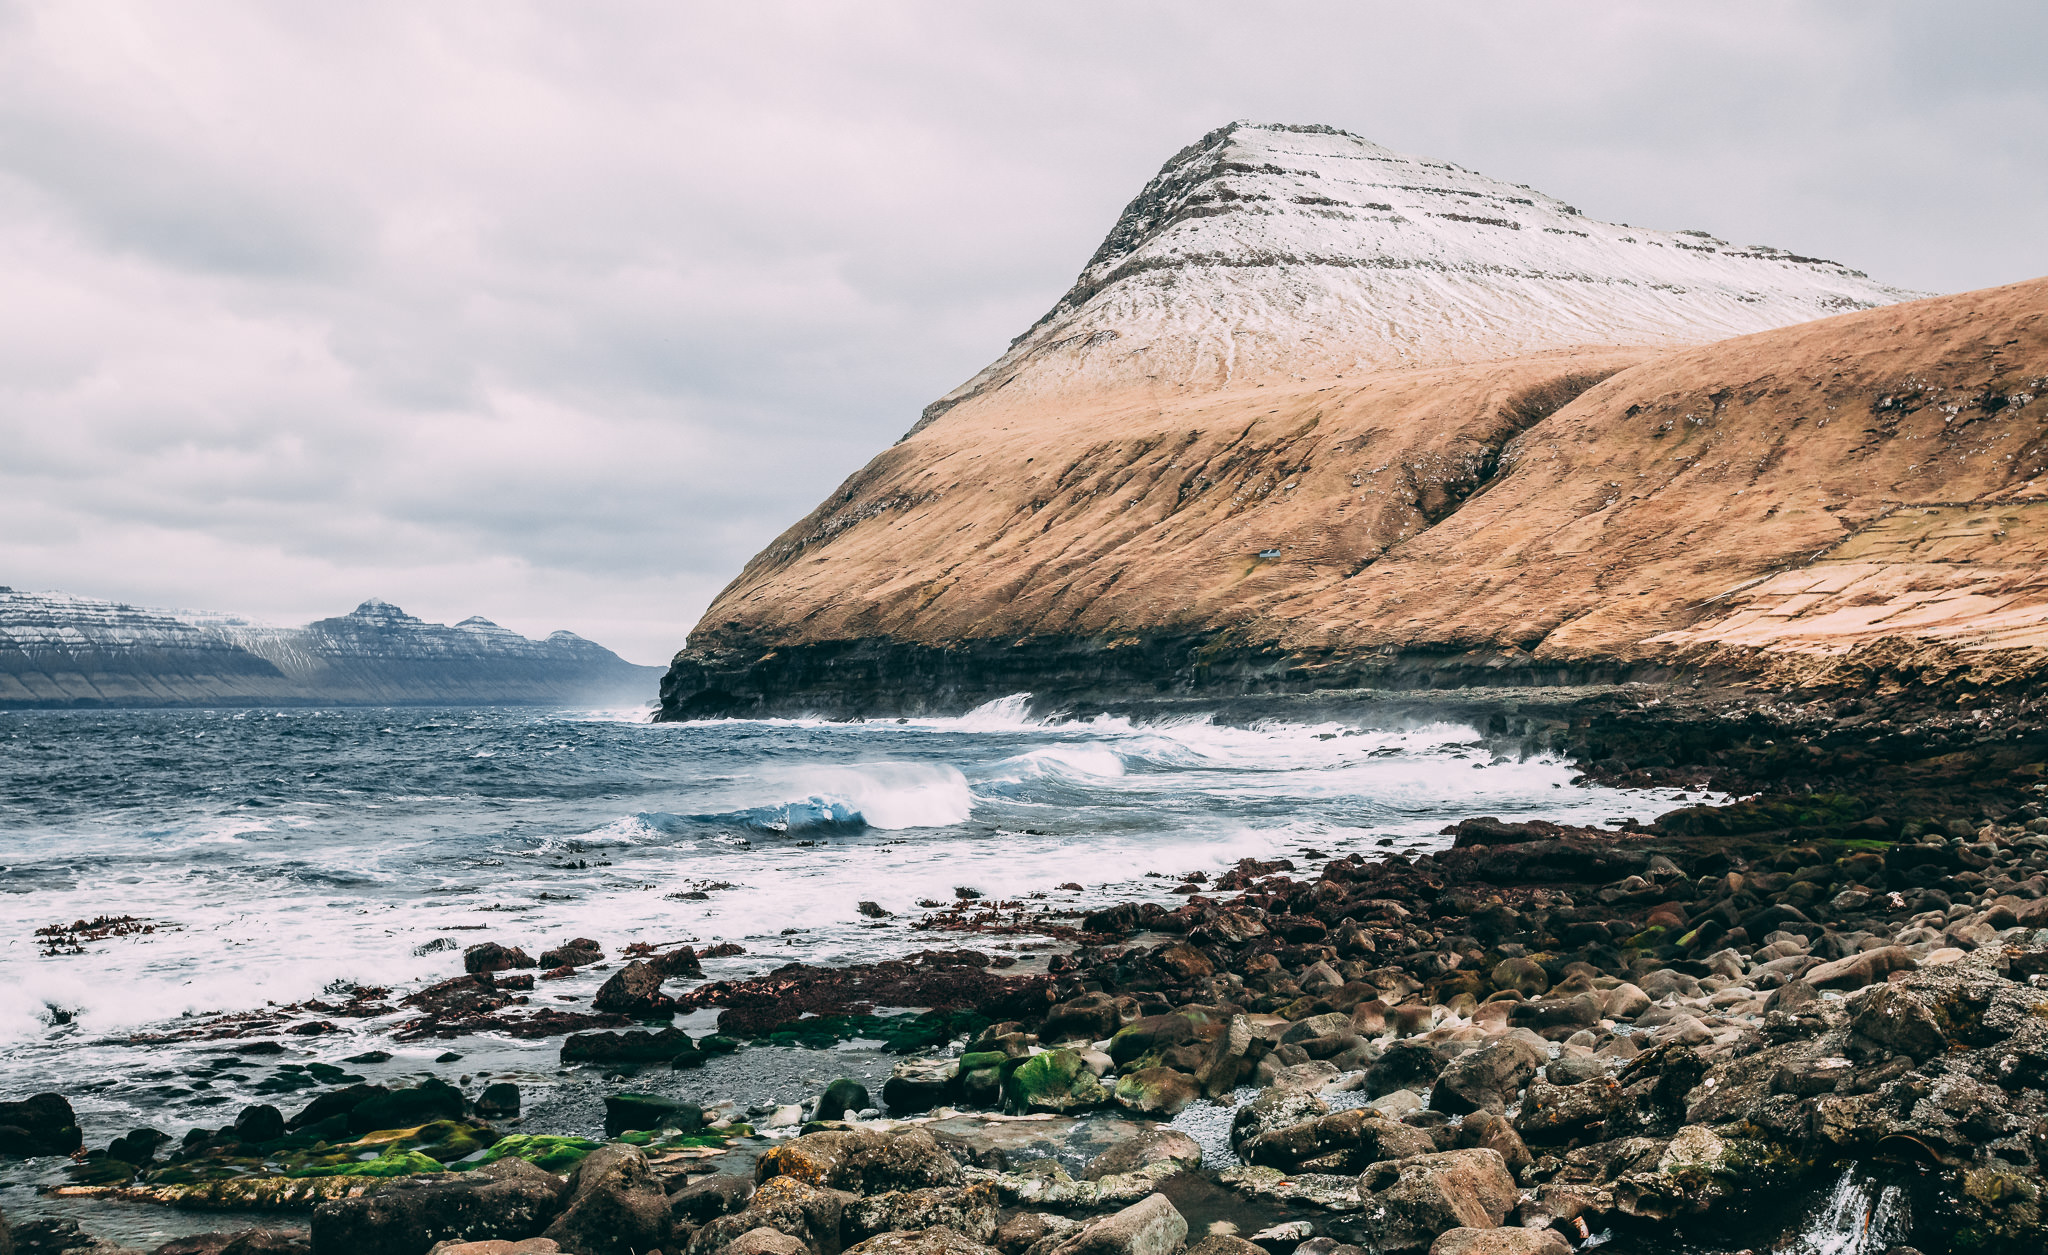 FaroeIslands-Gjógv-Instagram-HansChristianStrikert-1.jpg